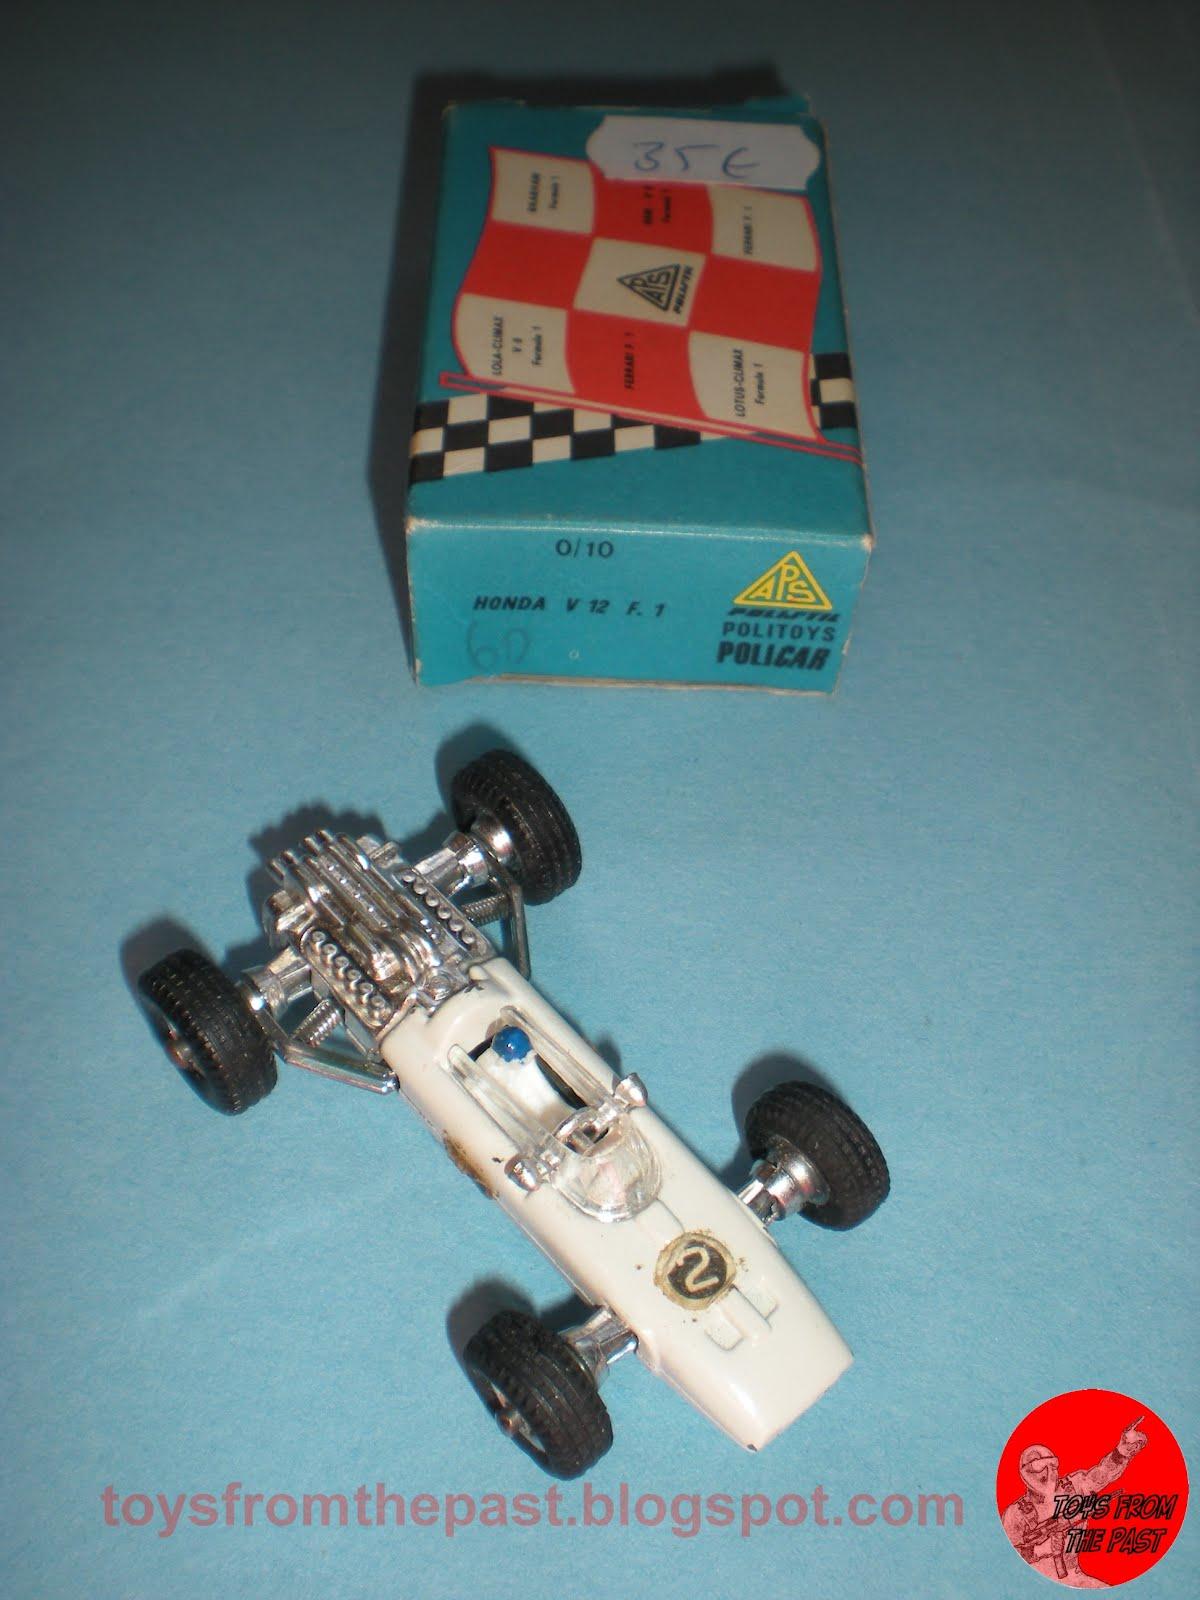 Penny 0/10 Honda V 12 F1 (cc-by-nc-nd 3.0 toysfromthepast)